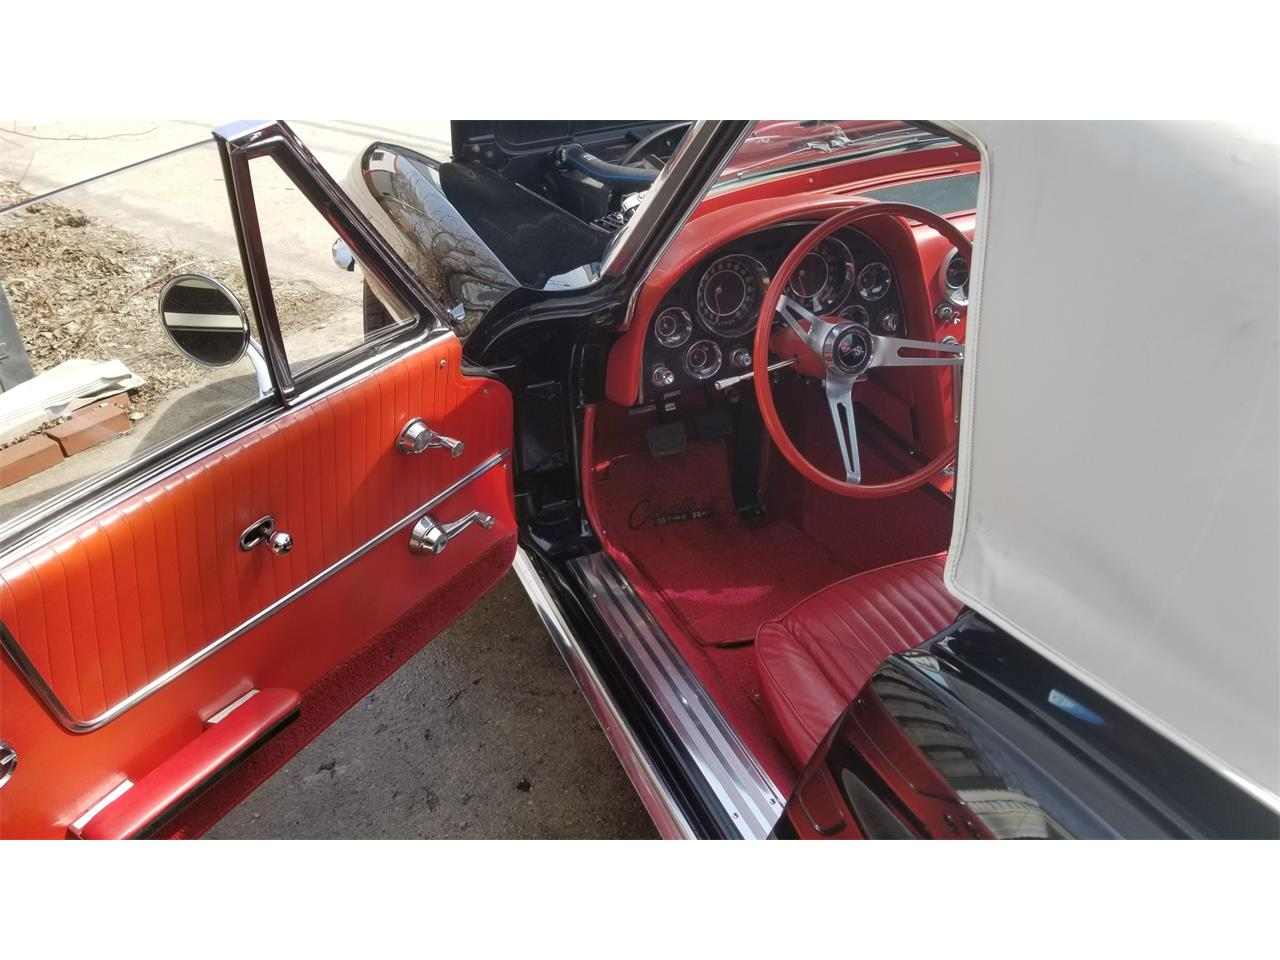 1964 Chevrolet Corvette (CC-1217189) for sale in Evanston, Illinois